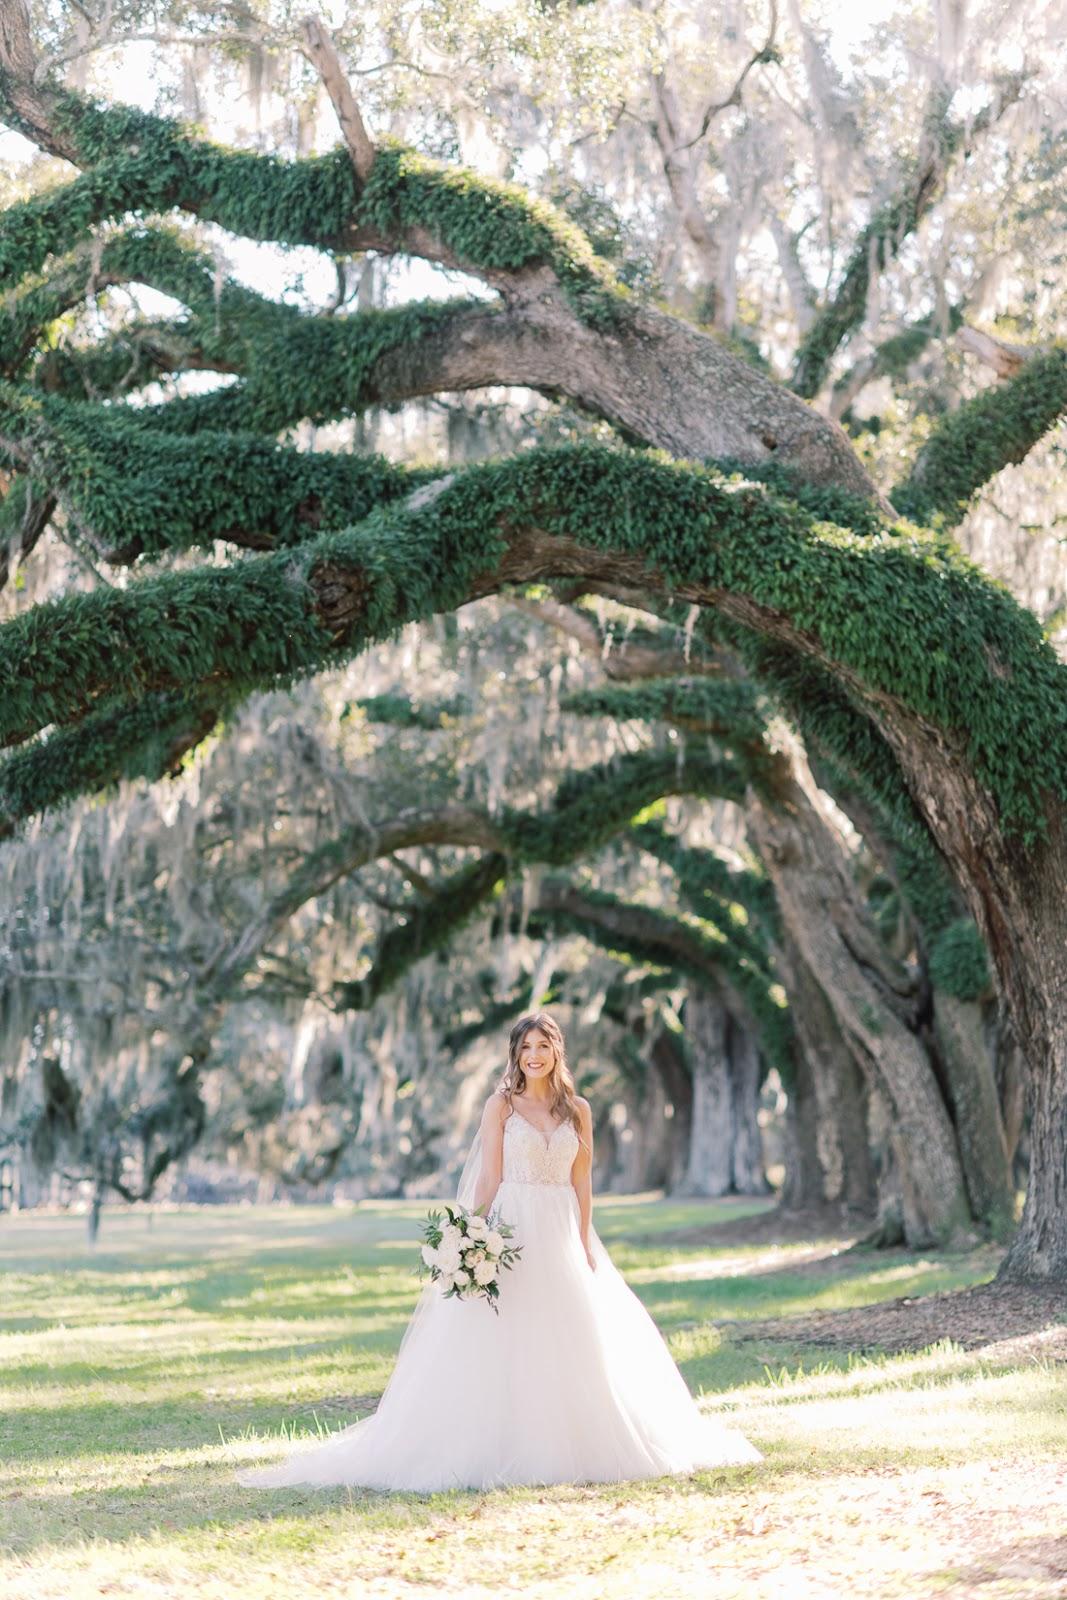 Boone Hall Plantation Bridal Portraits - Chasing Cinderella